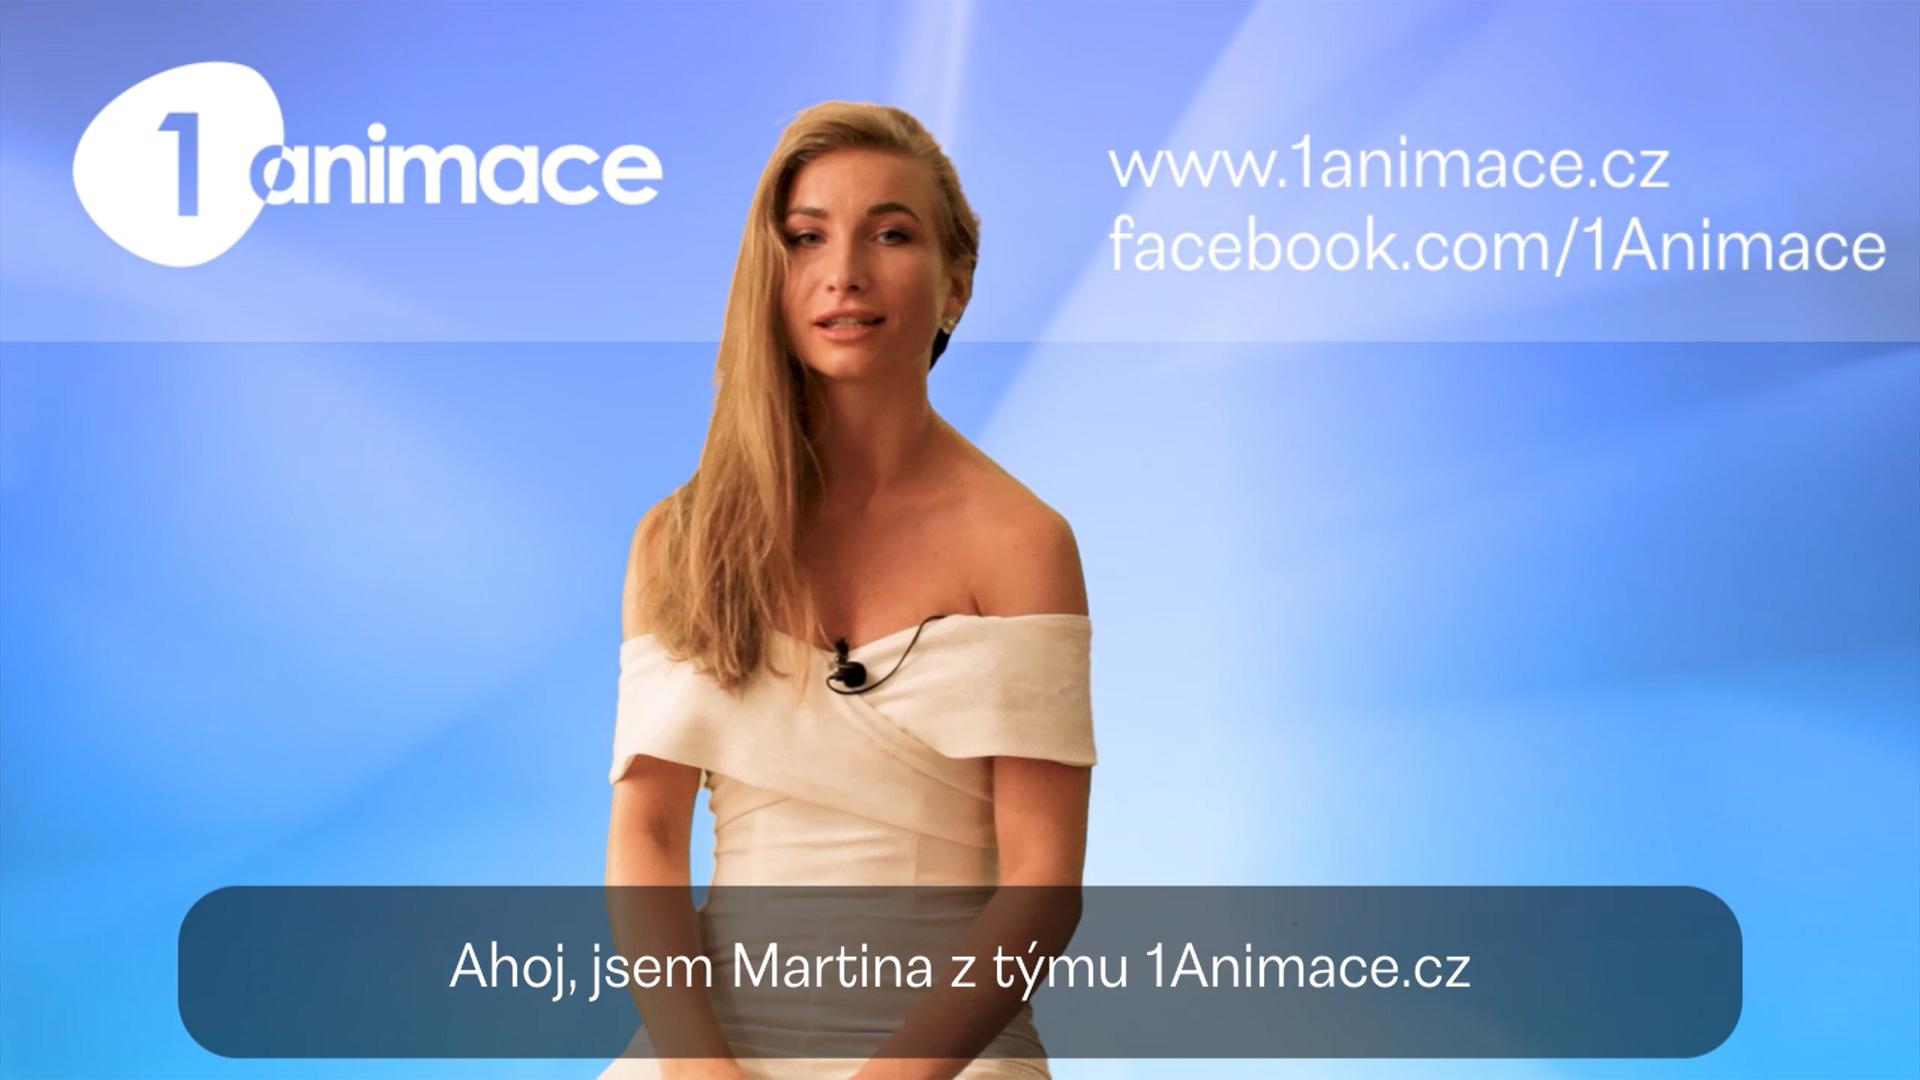 https://artware.cz/wp-content/uploads/2020/07/Soutěž-sluchátka-FB.mp4